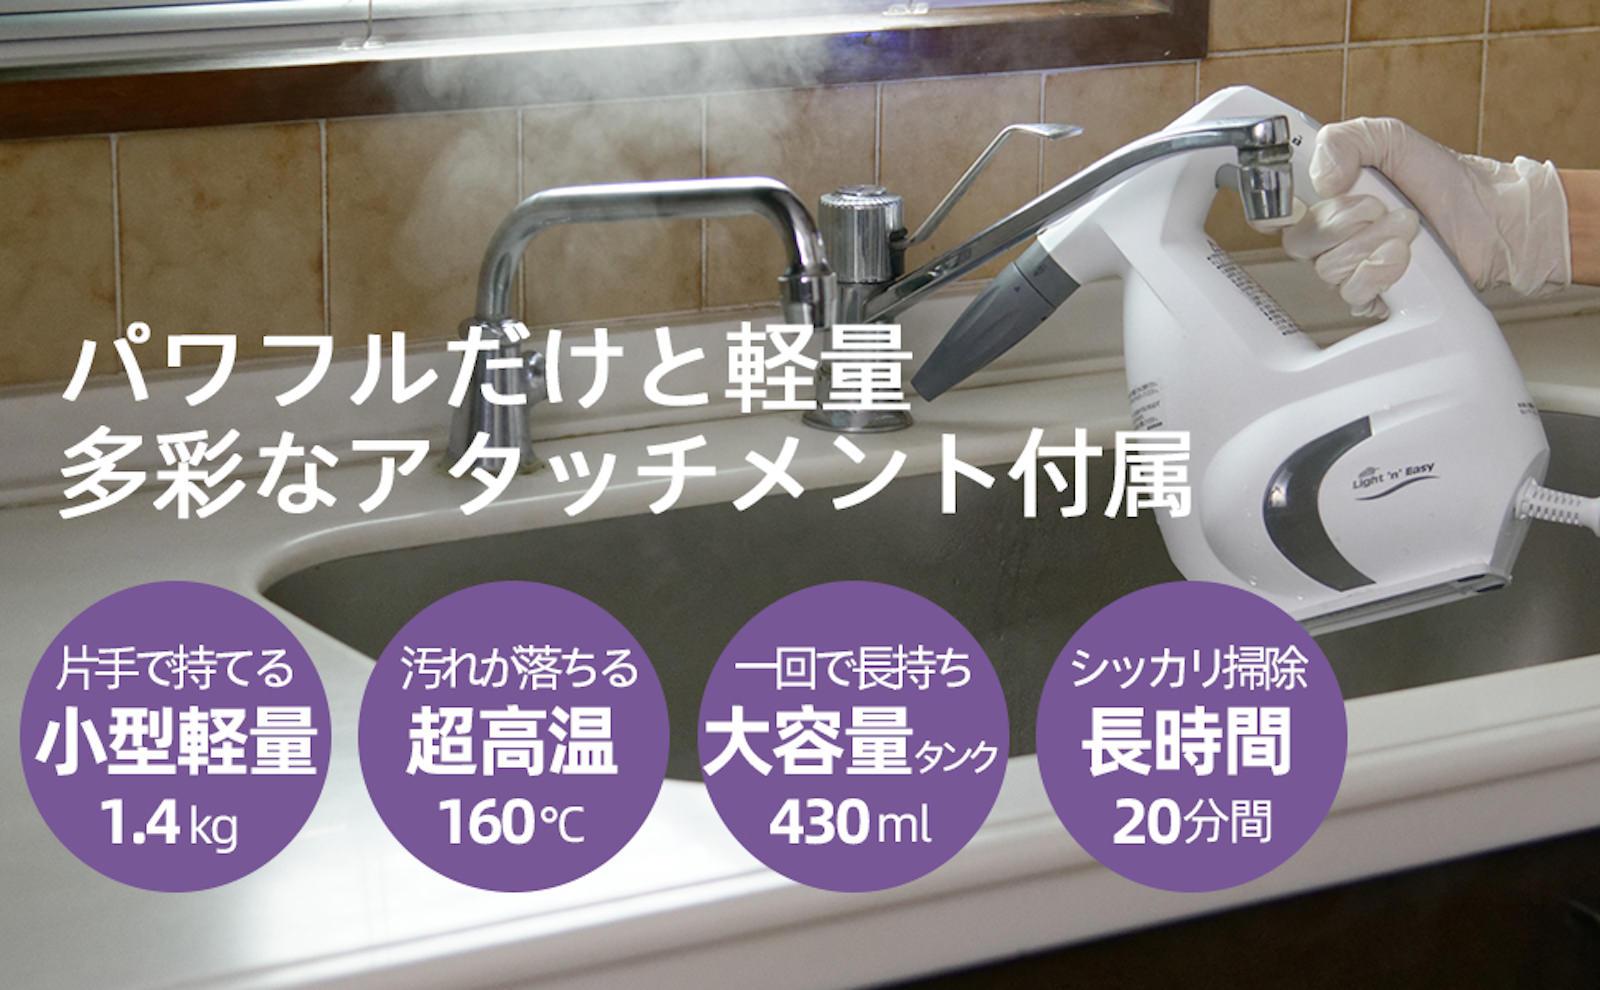 Steamgo-by-LightnEasy-Hand-Mop-Present-campagin-2.jpg